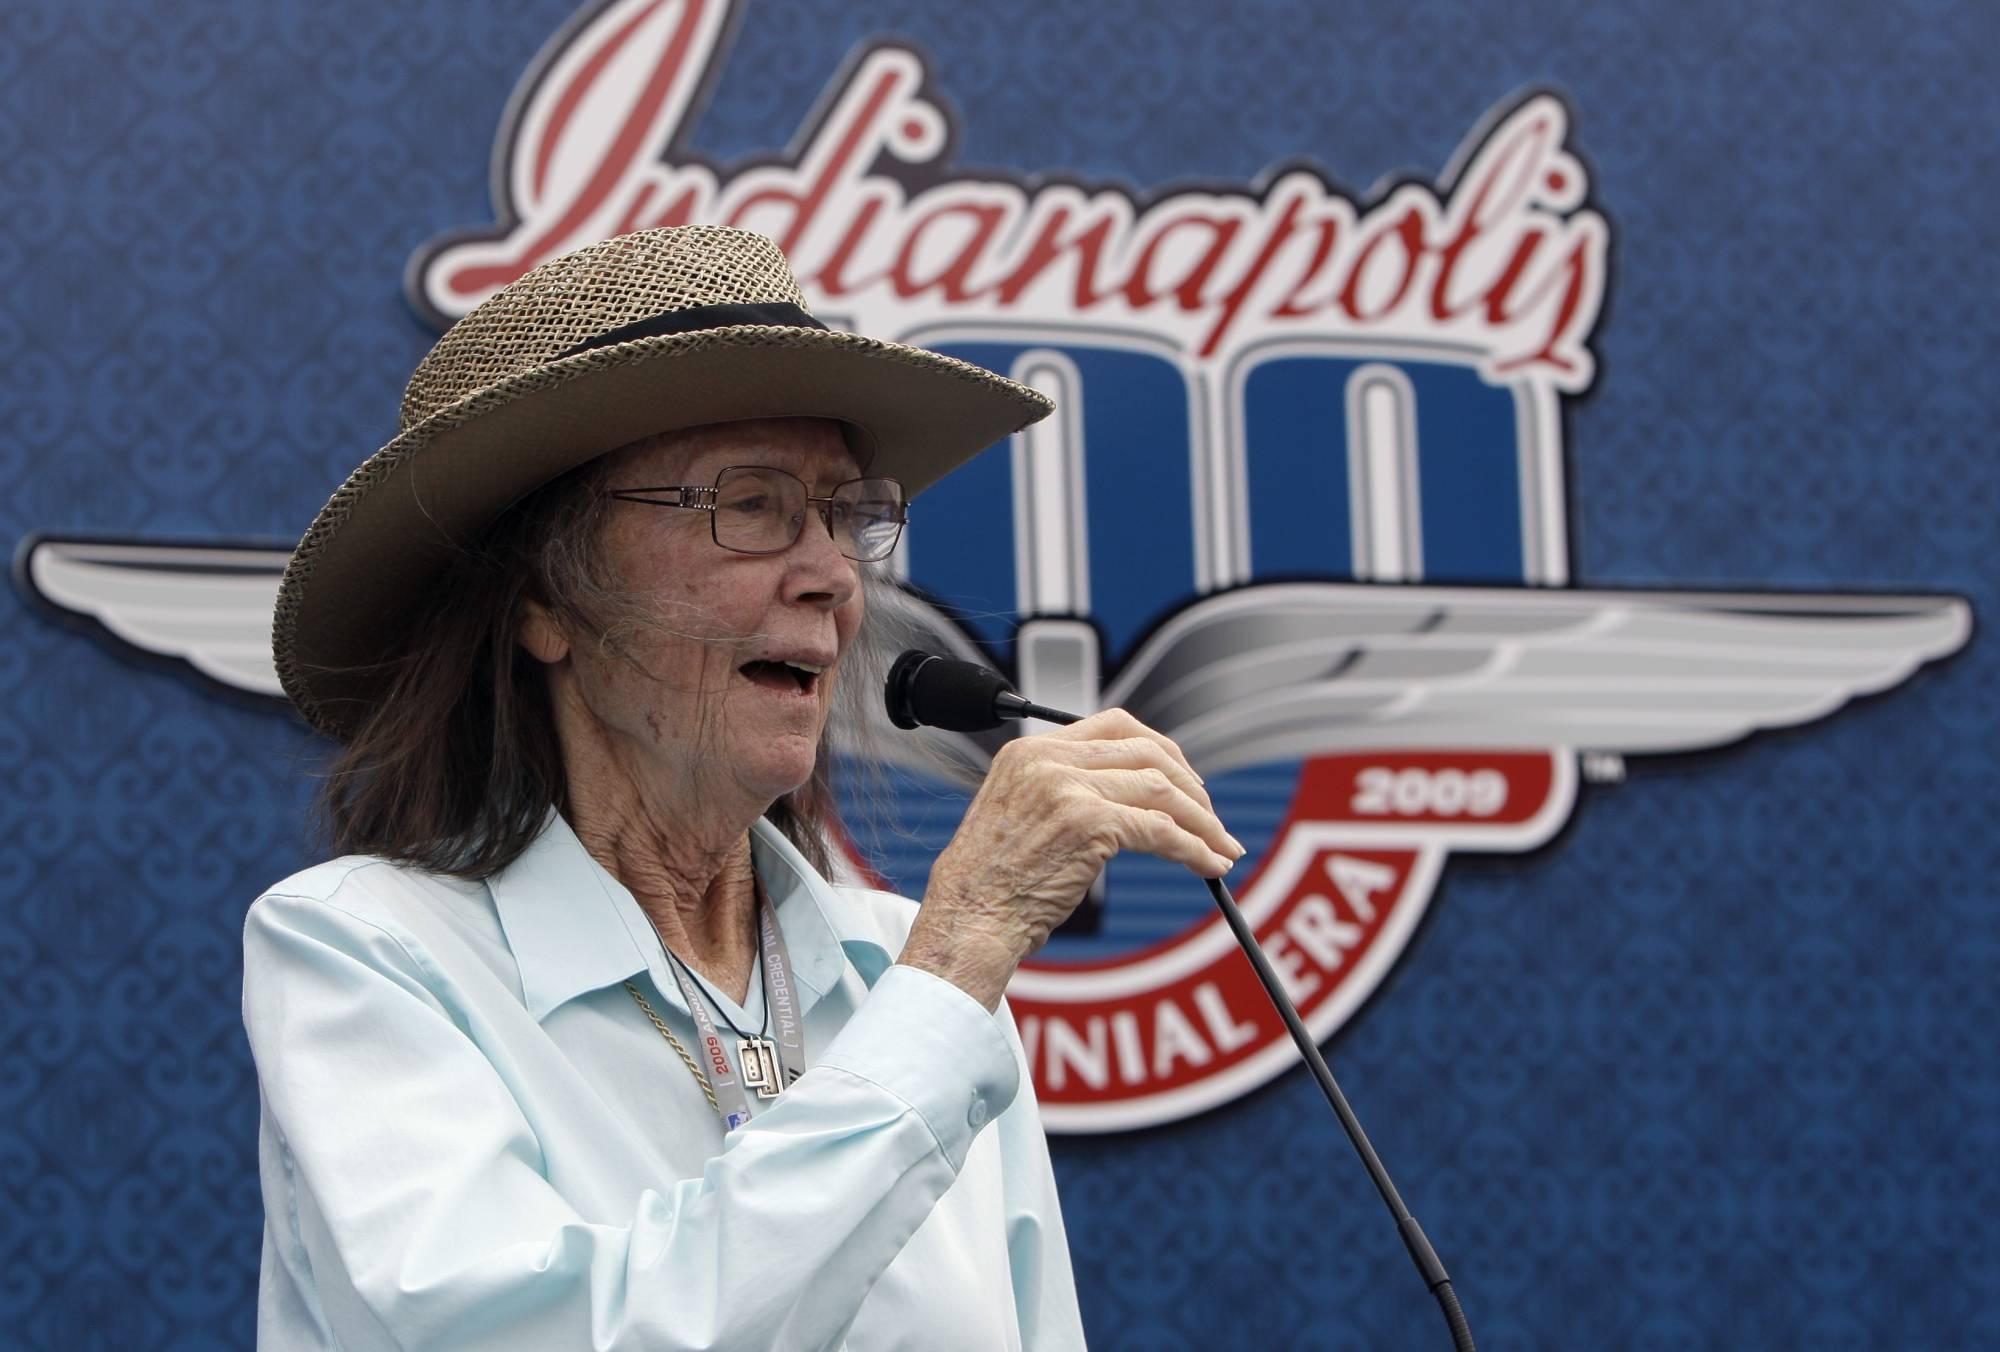 Mari hulman george indy s quiet pioneer dies at 83 for Indianapolis motor speedway indianapolis in